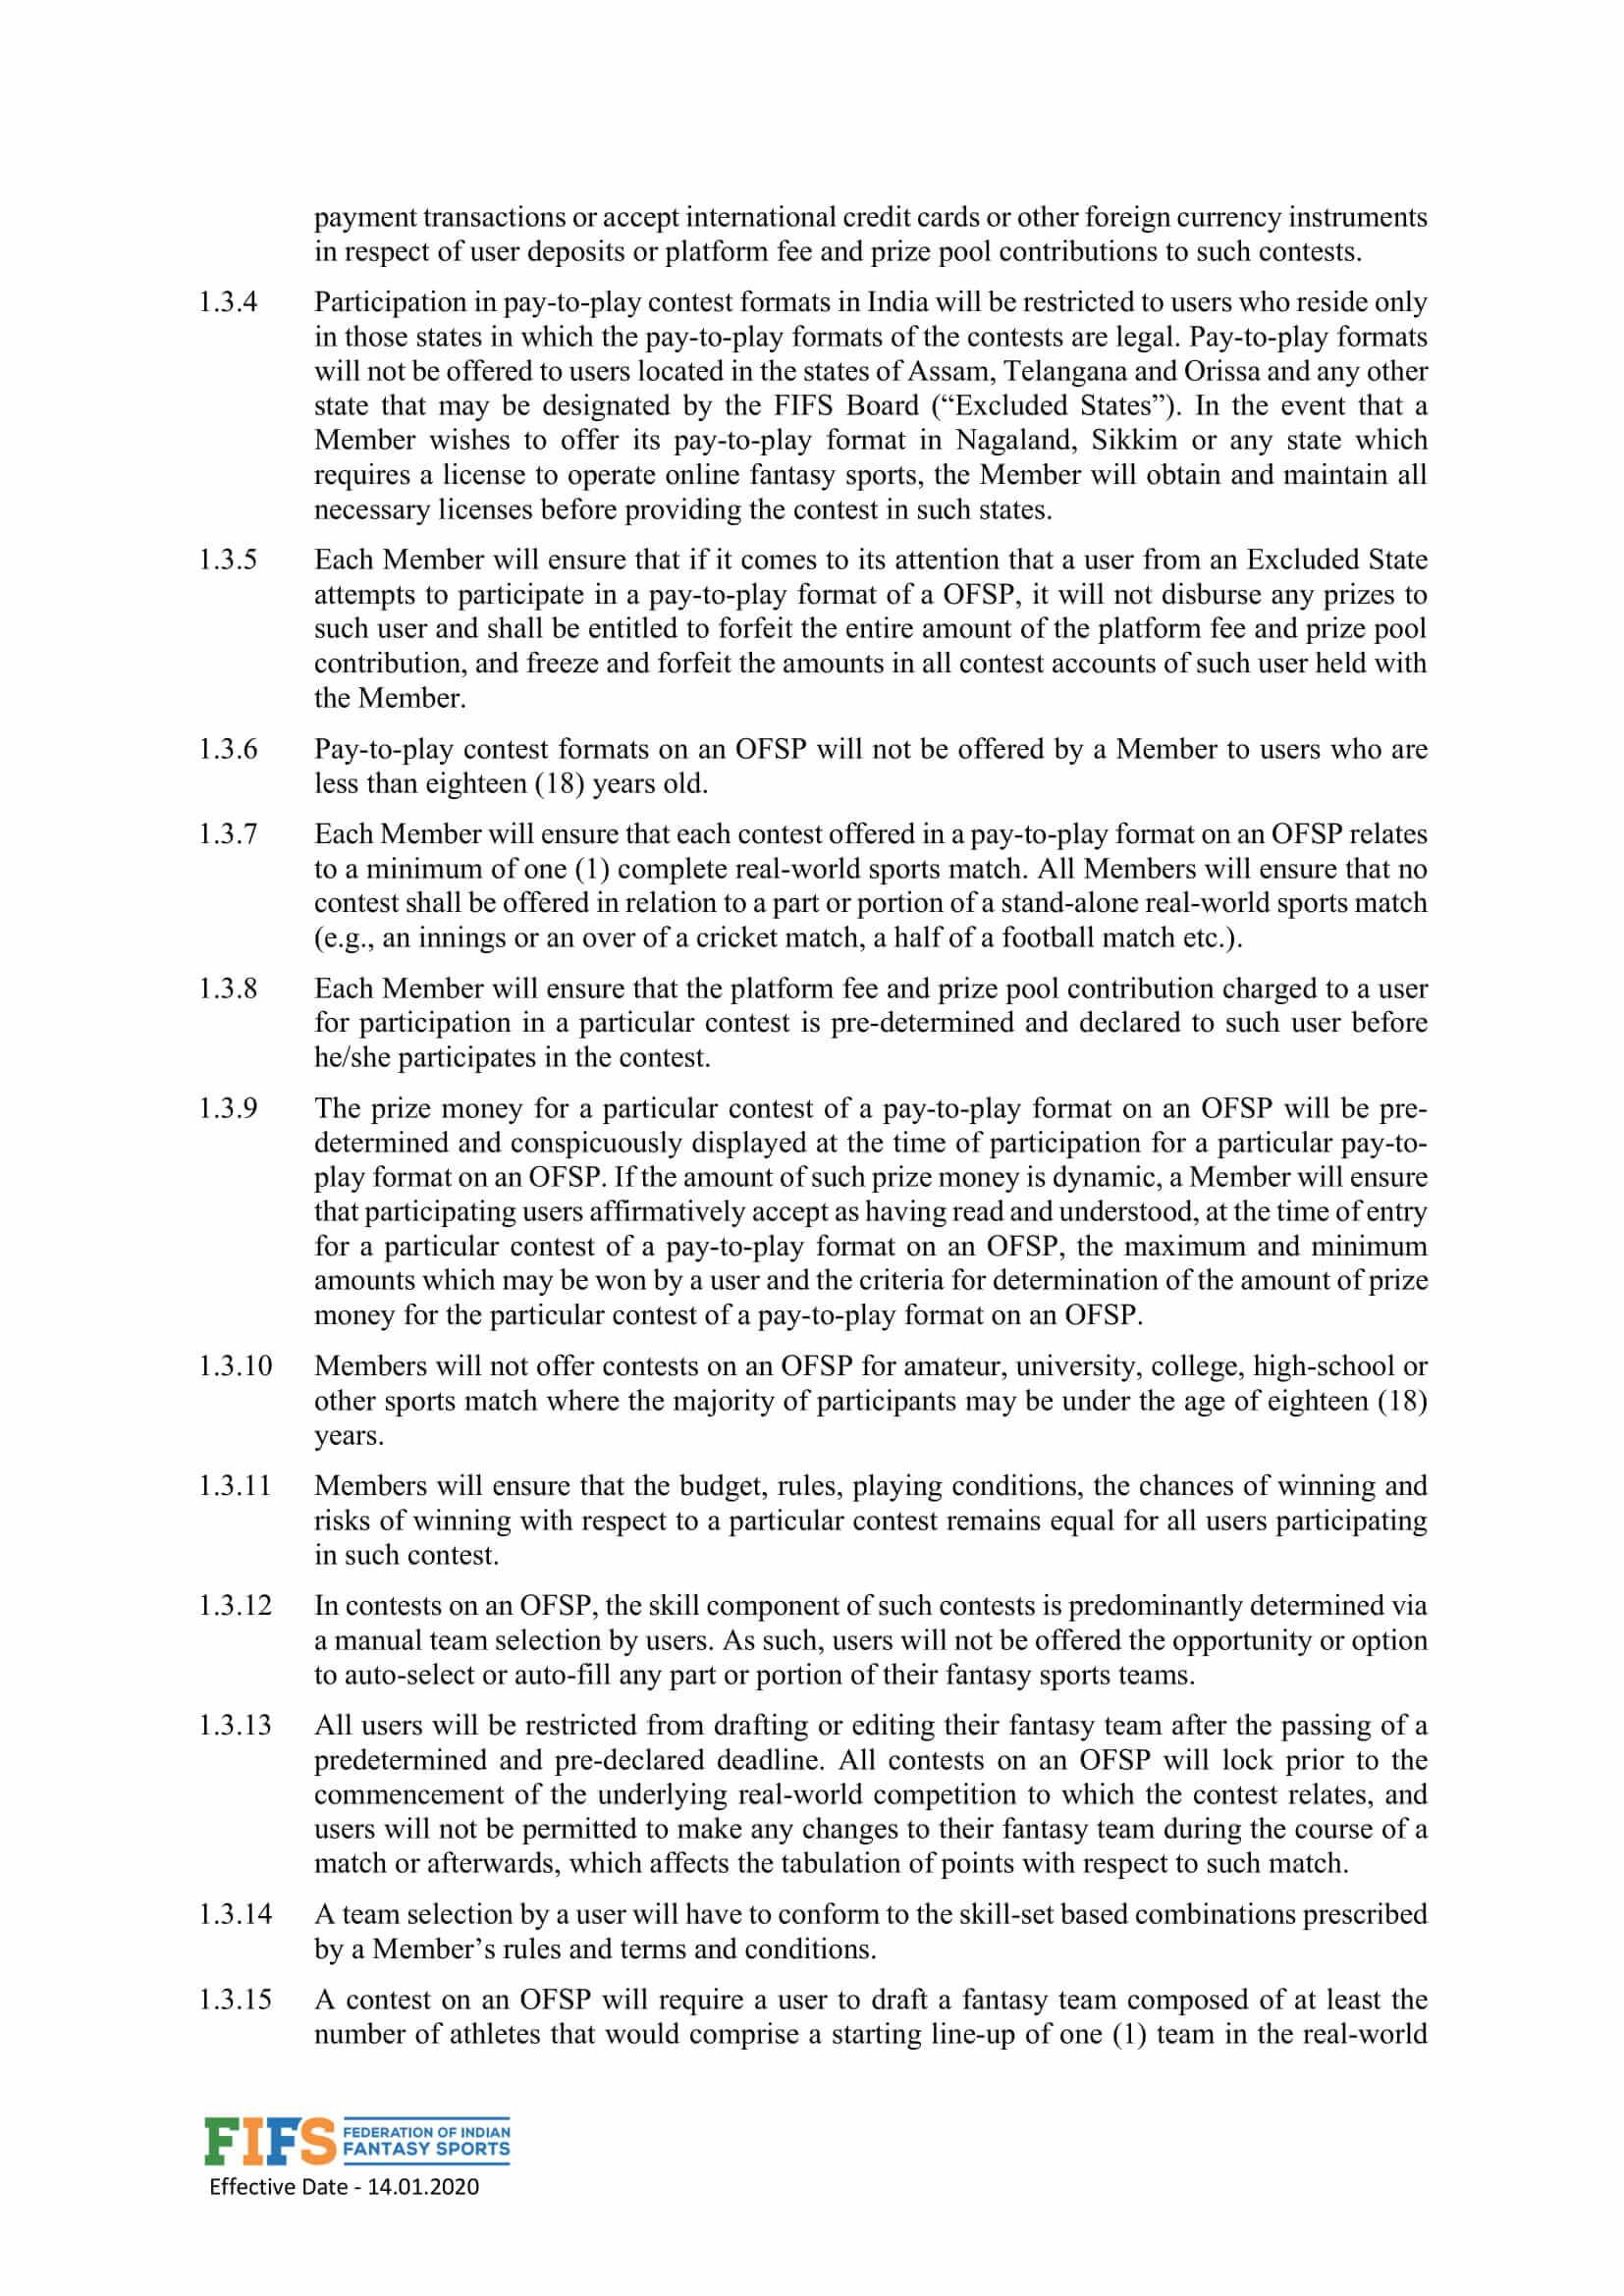 FIFS Charter Page 3